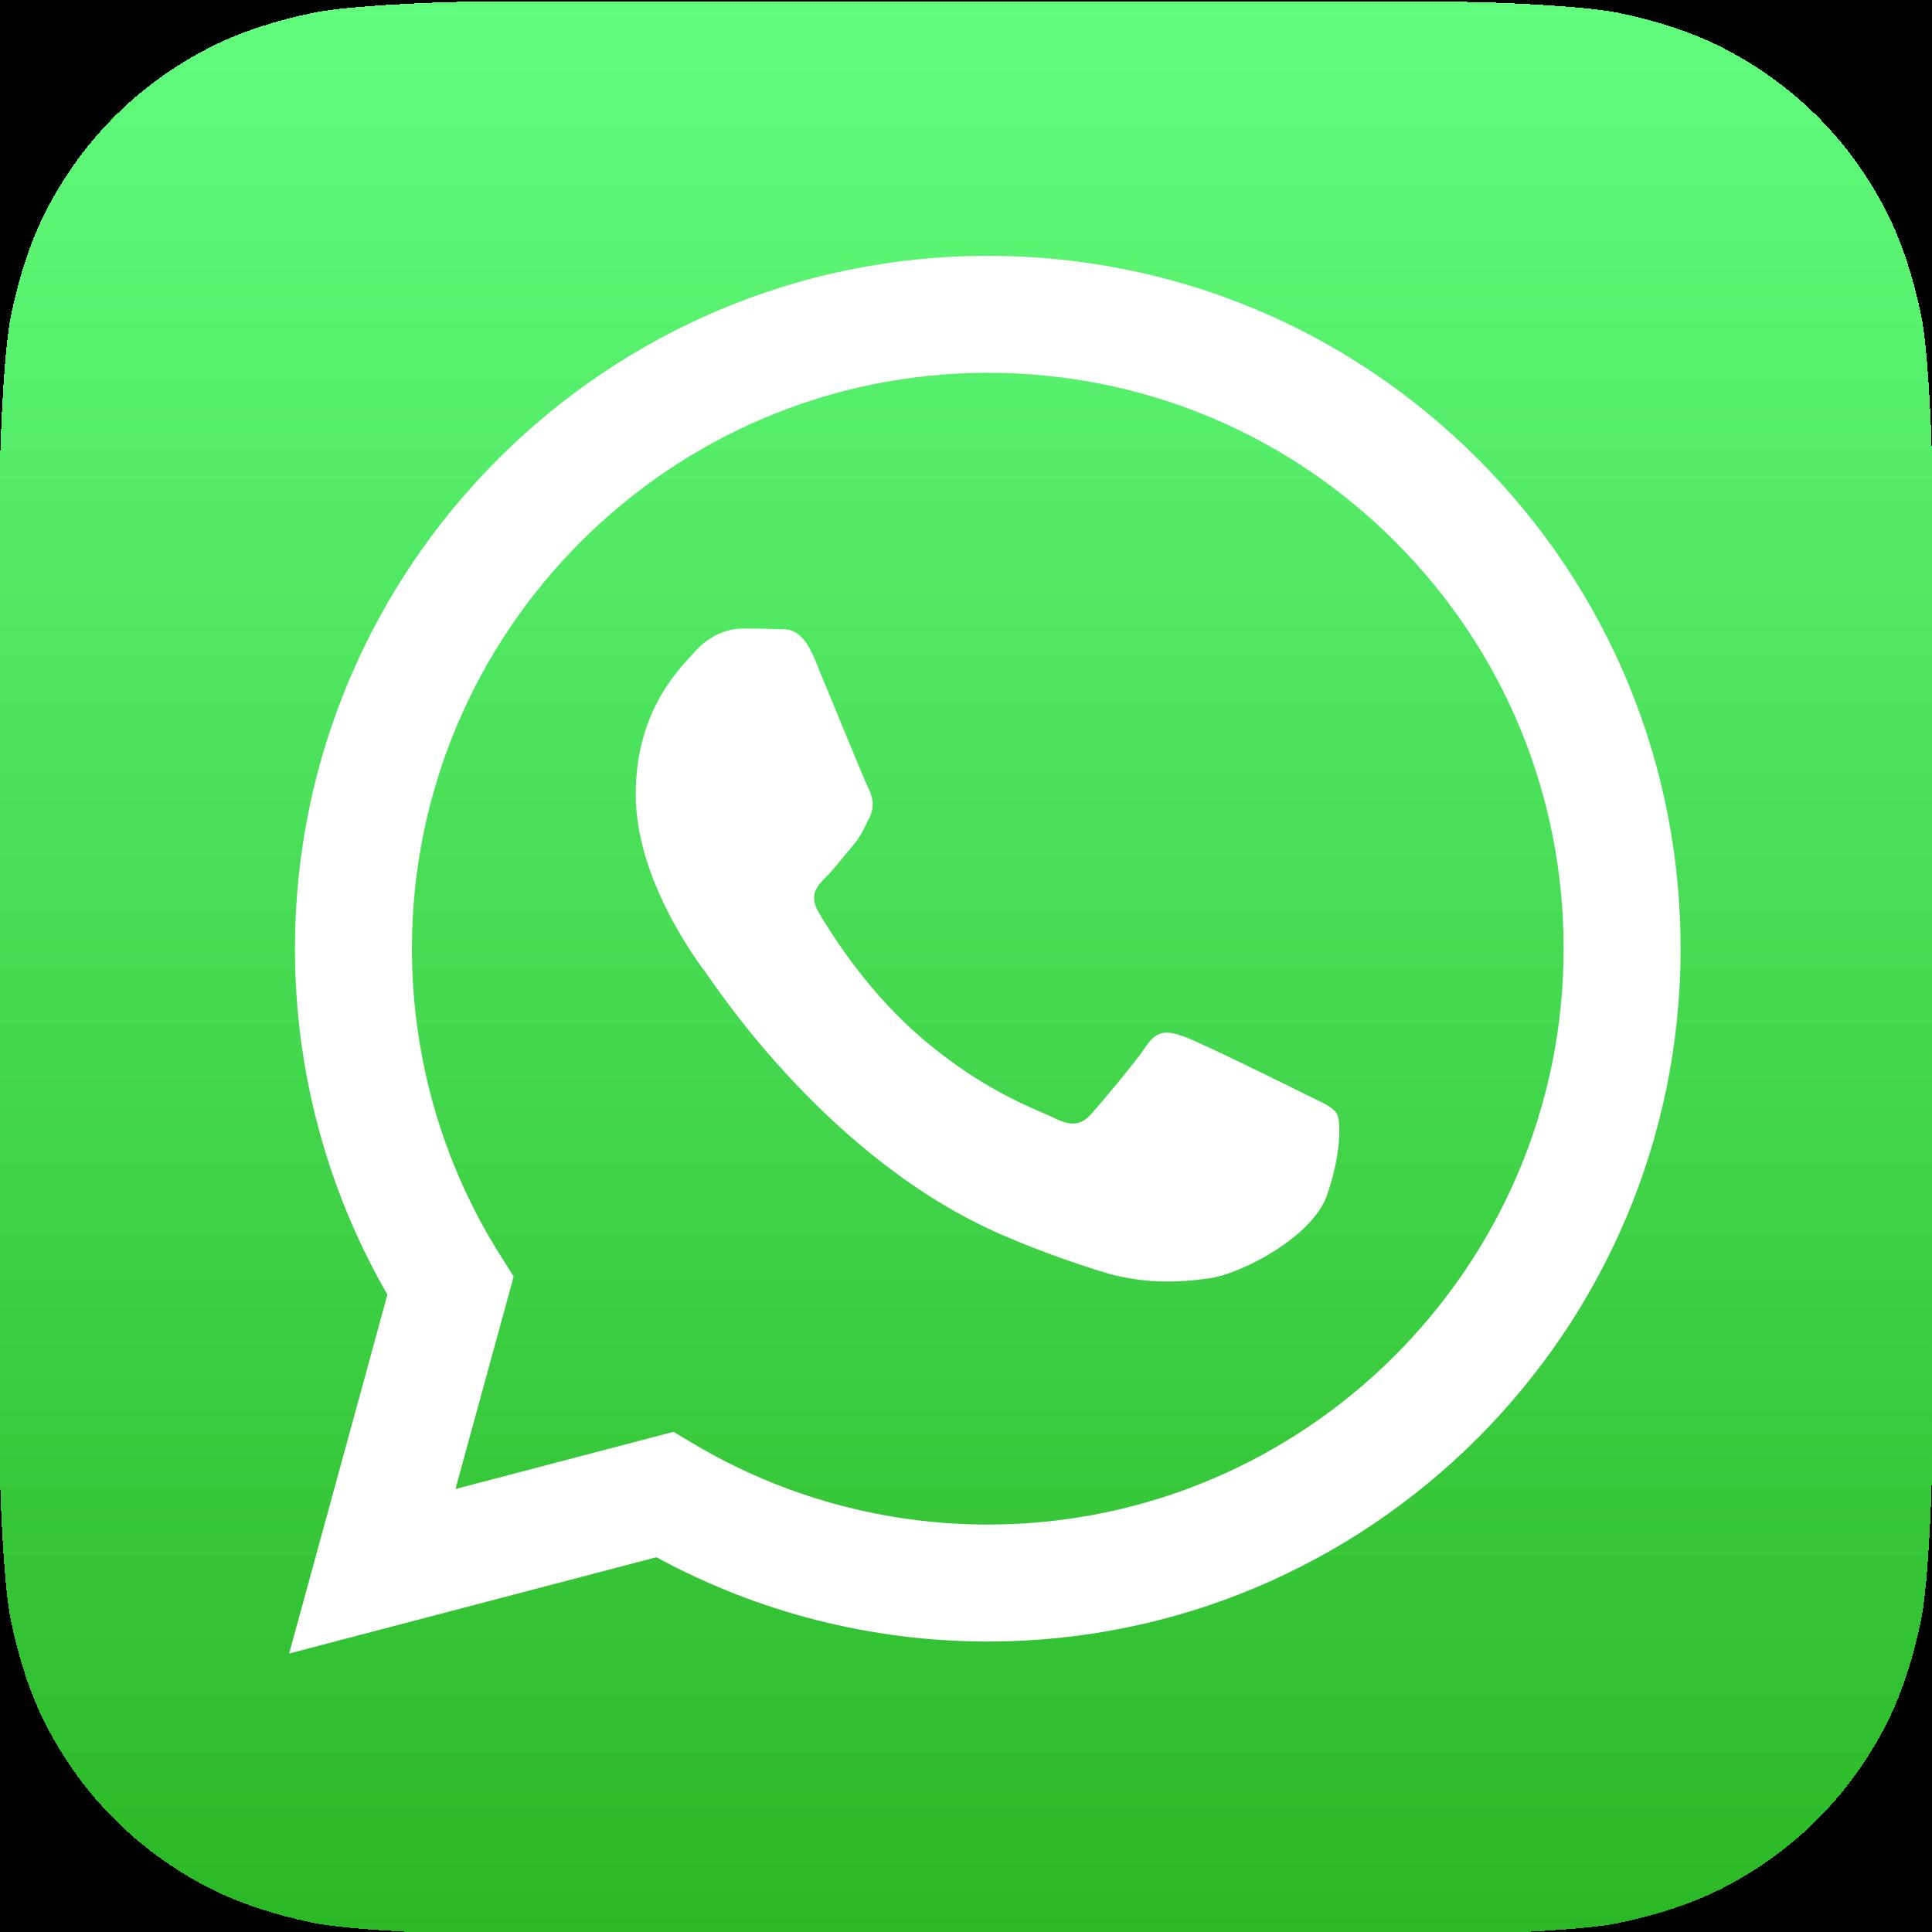 Icon logo clipart transparent library Whatsapp Icon Logo Png transparent library